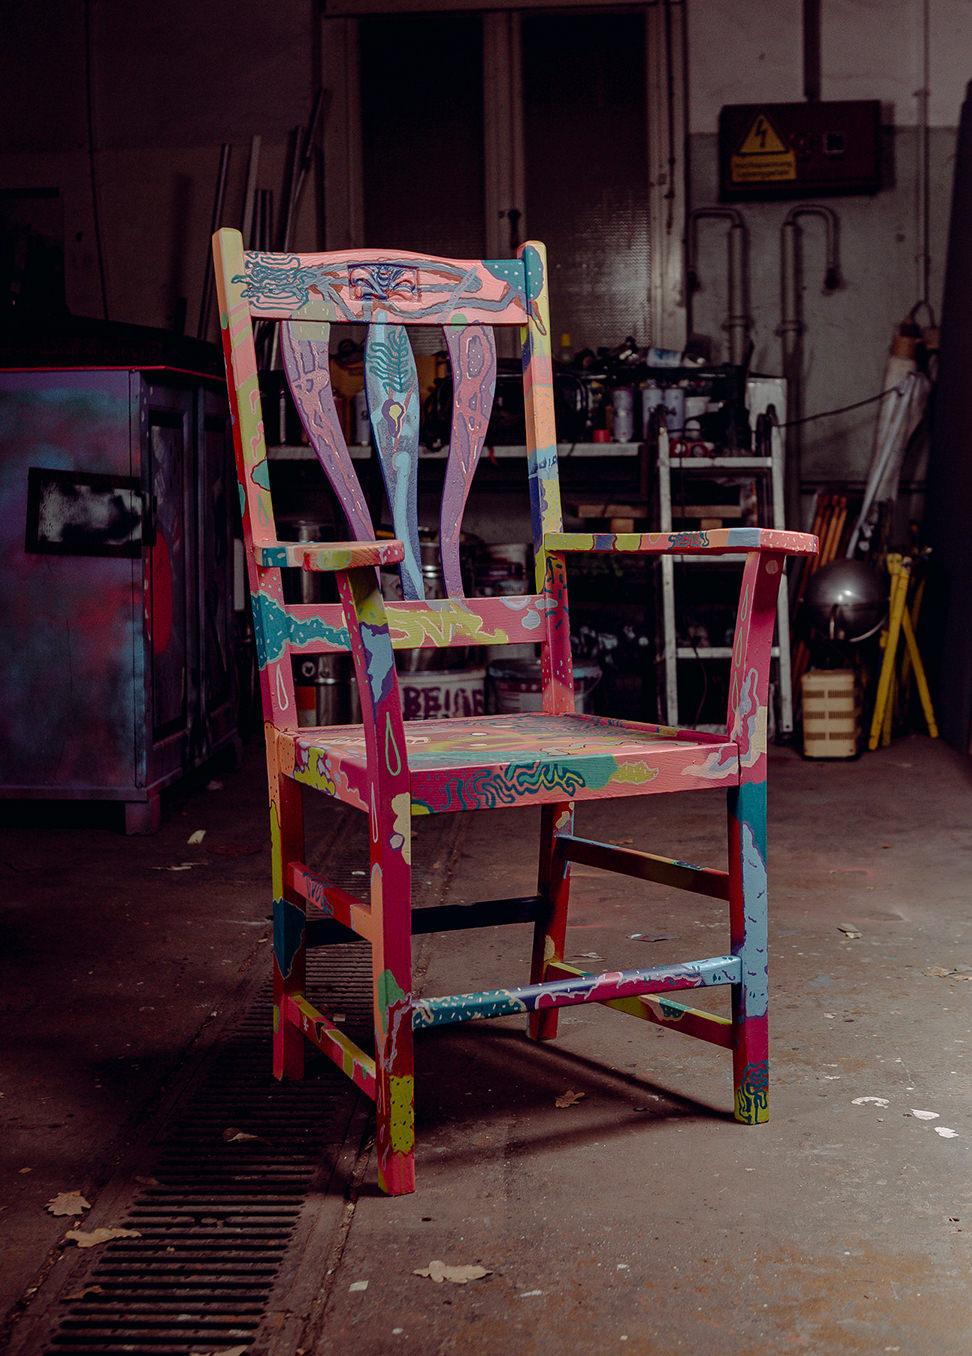 ohpardon-graffiti-furniture-streetart-custom-furniture-04-2019_mg_0312